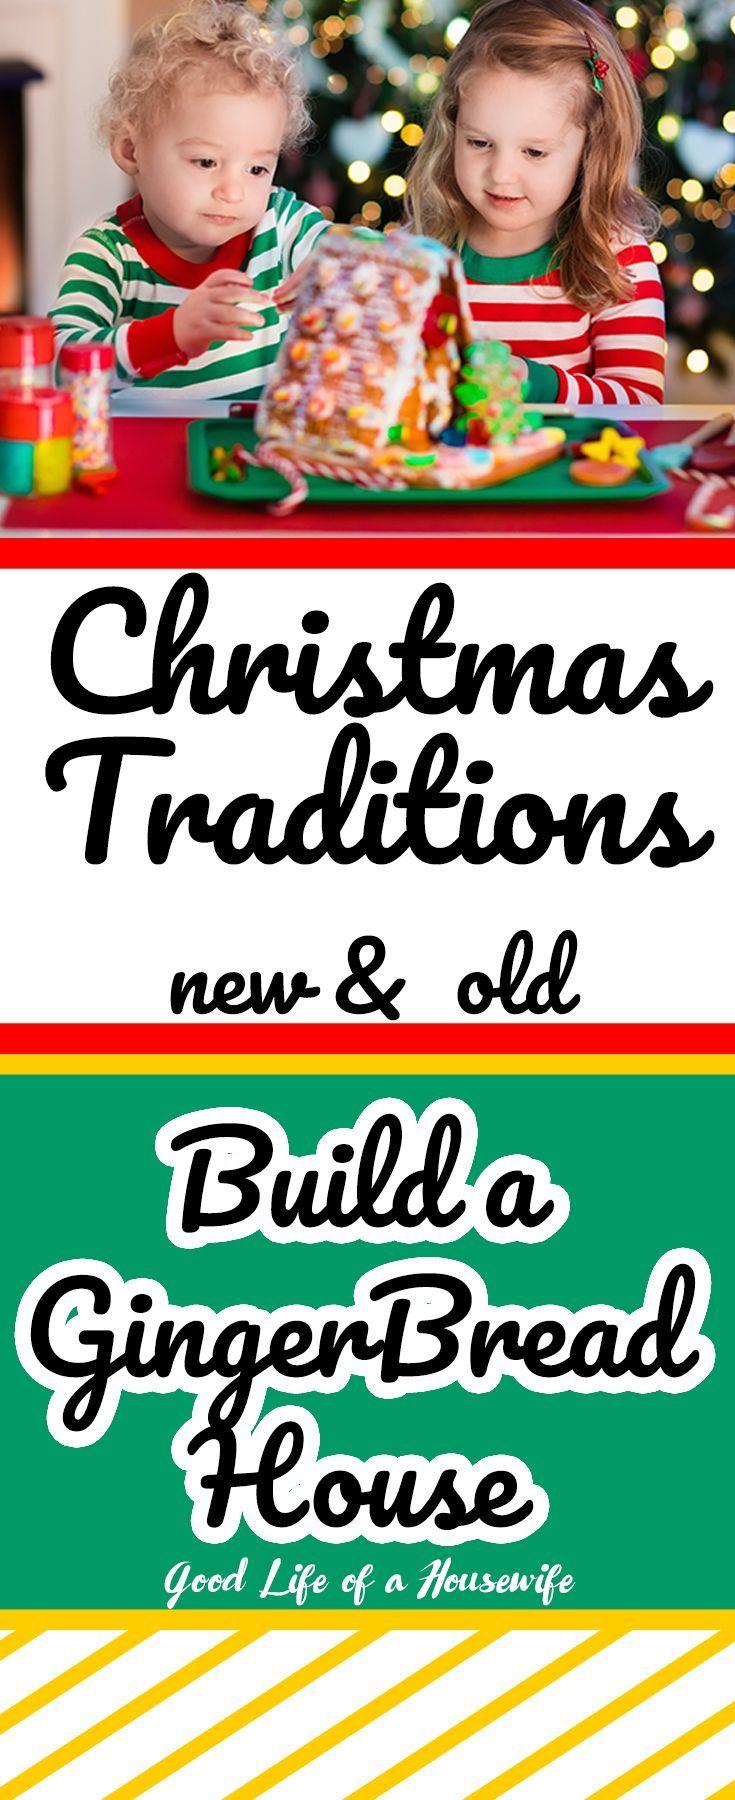 86 TRADITIONS FOR THE CHRISTMAS SEASON #Christmasbucketlist #ChristmasGoals #gingerbreadhouse